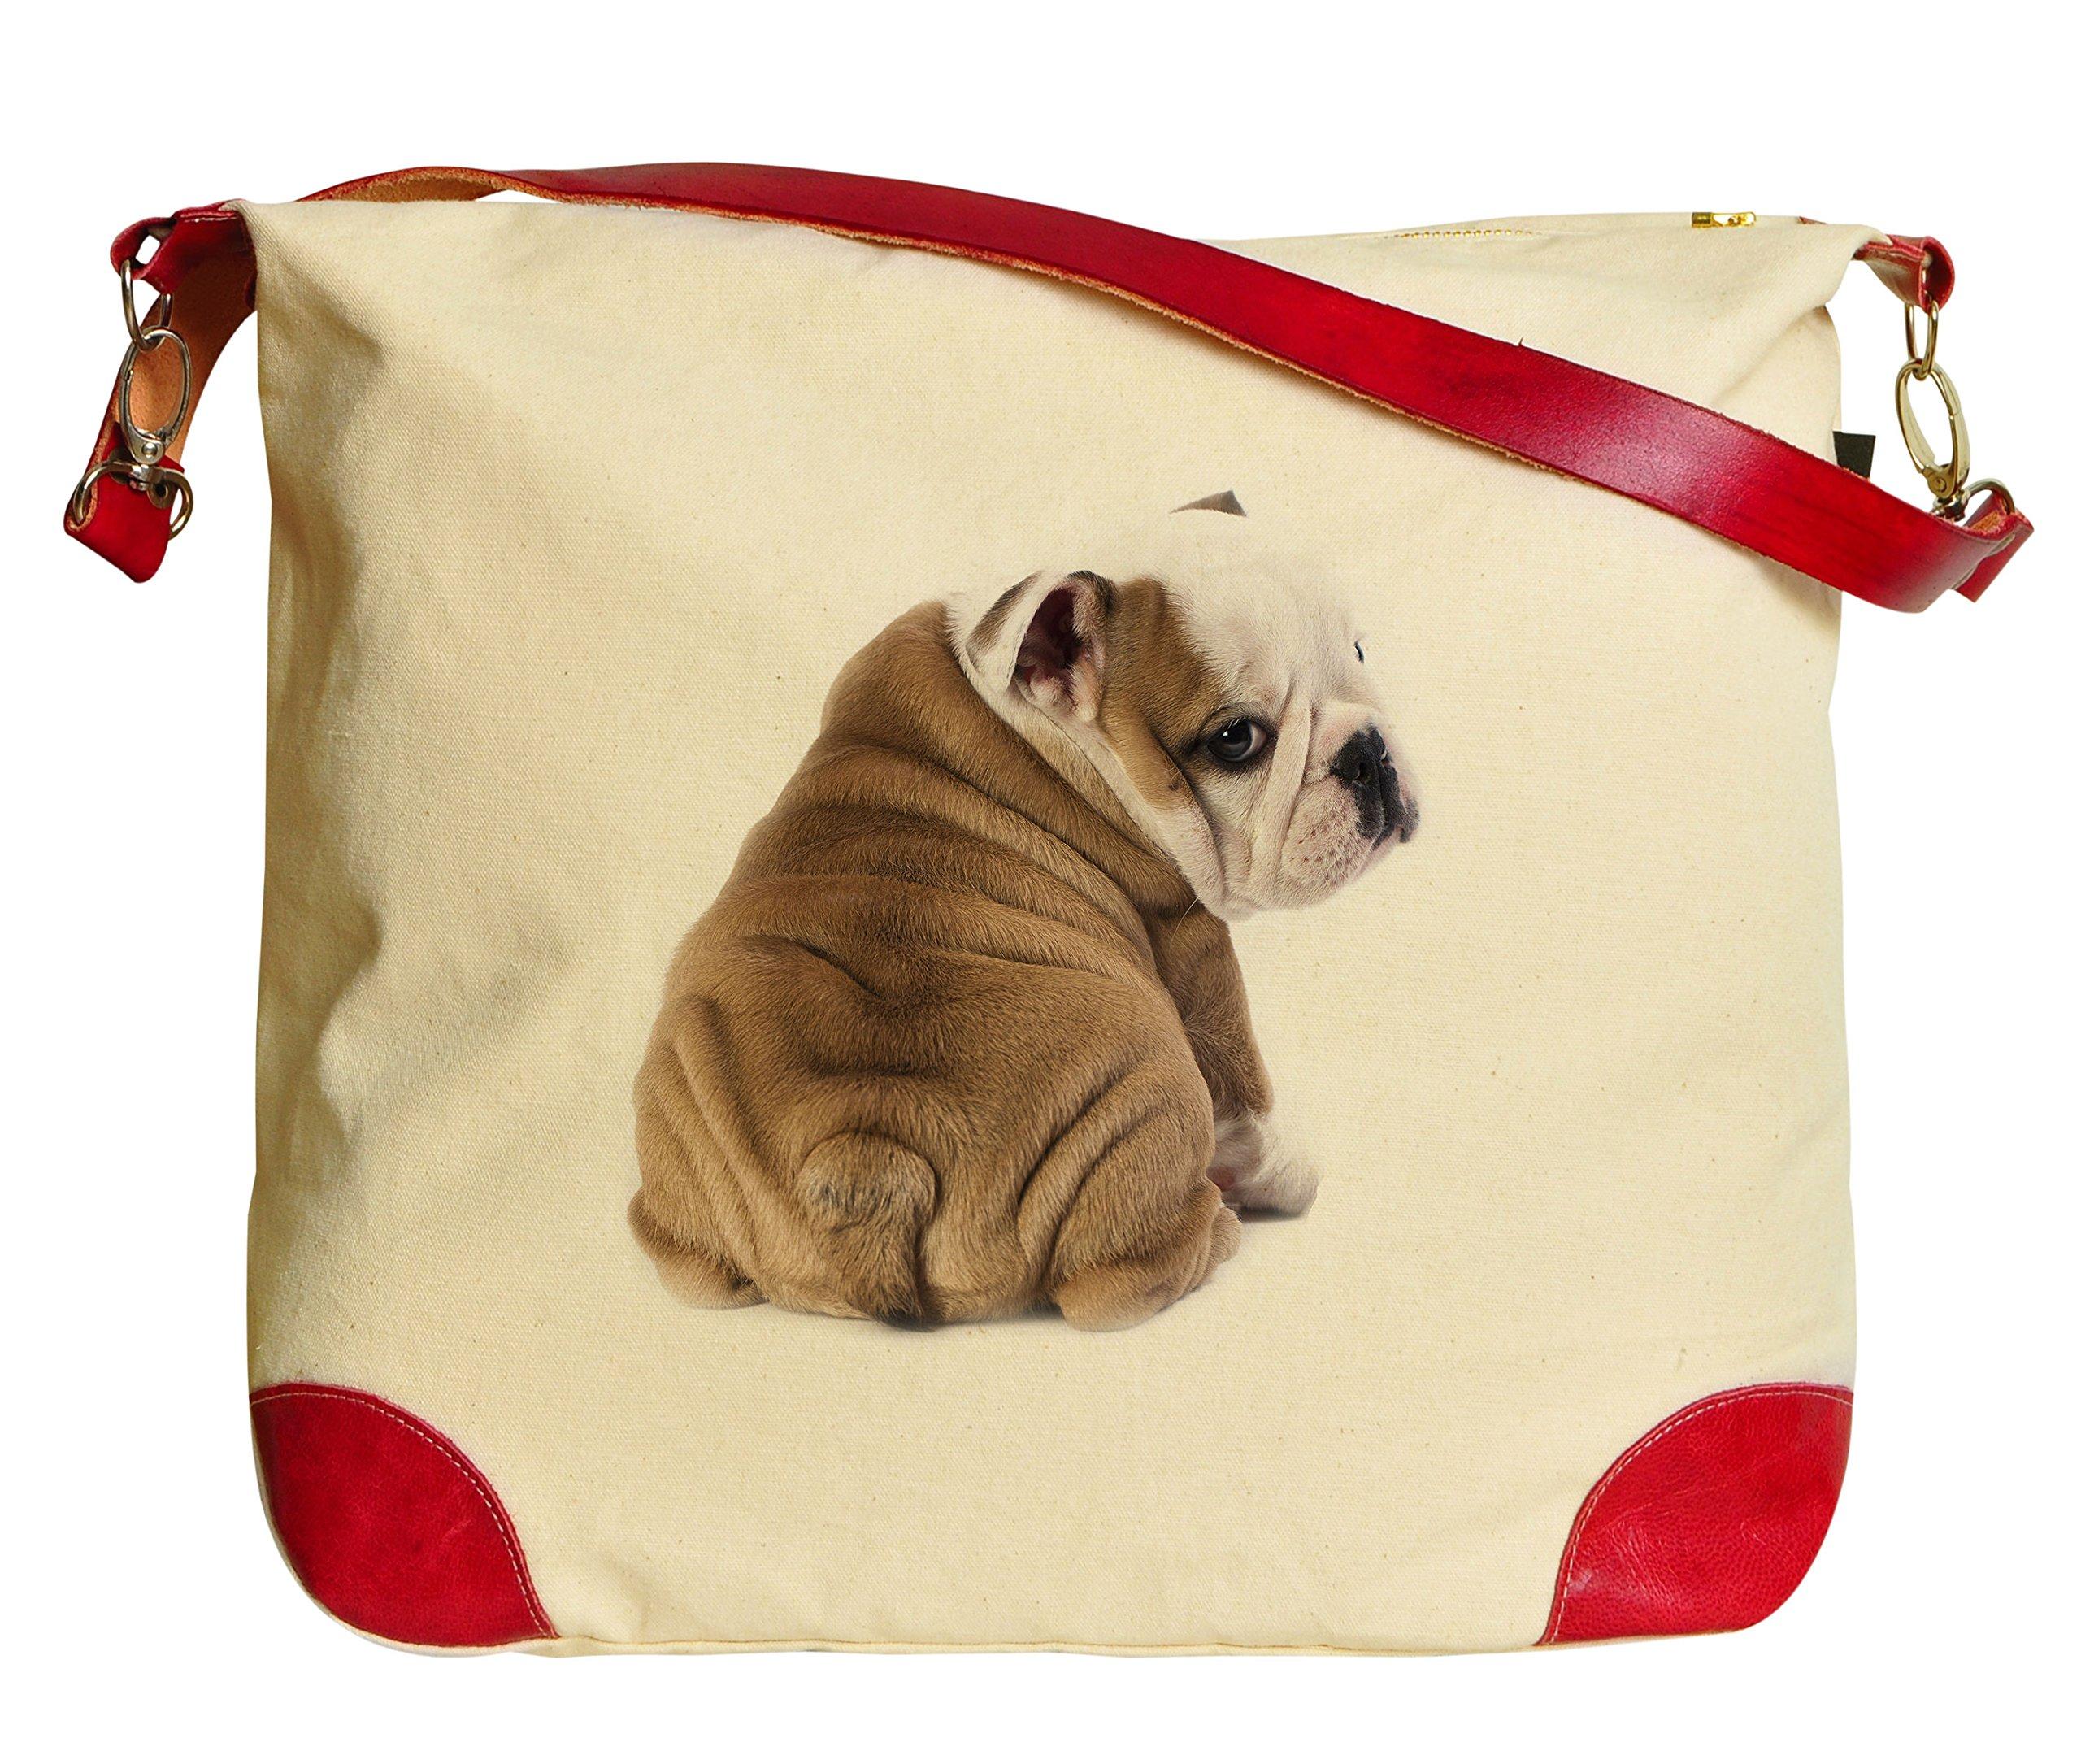 English Bulldog Puppy Beige Printed Canvas Tote Bag Shoulder Bag WAS_33